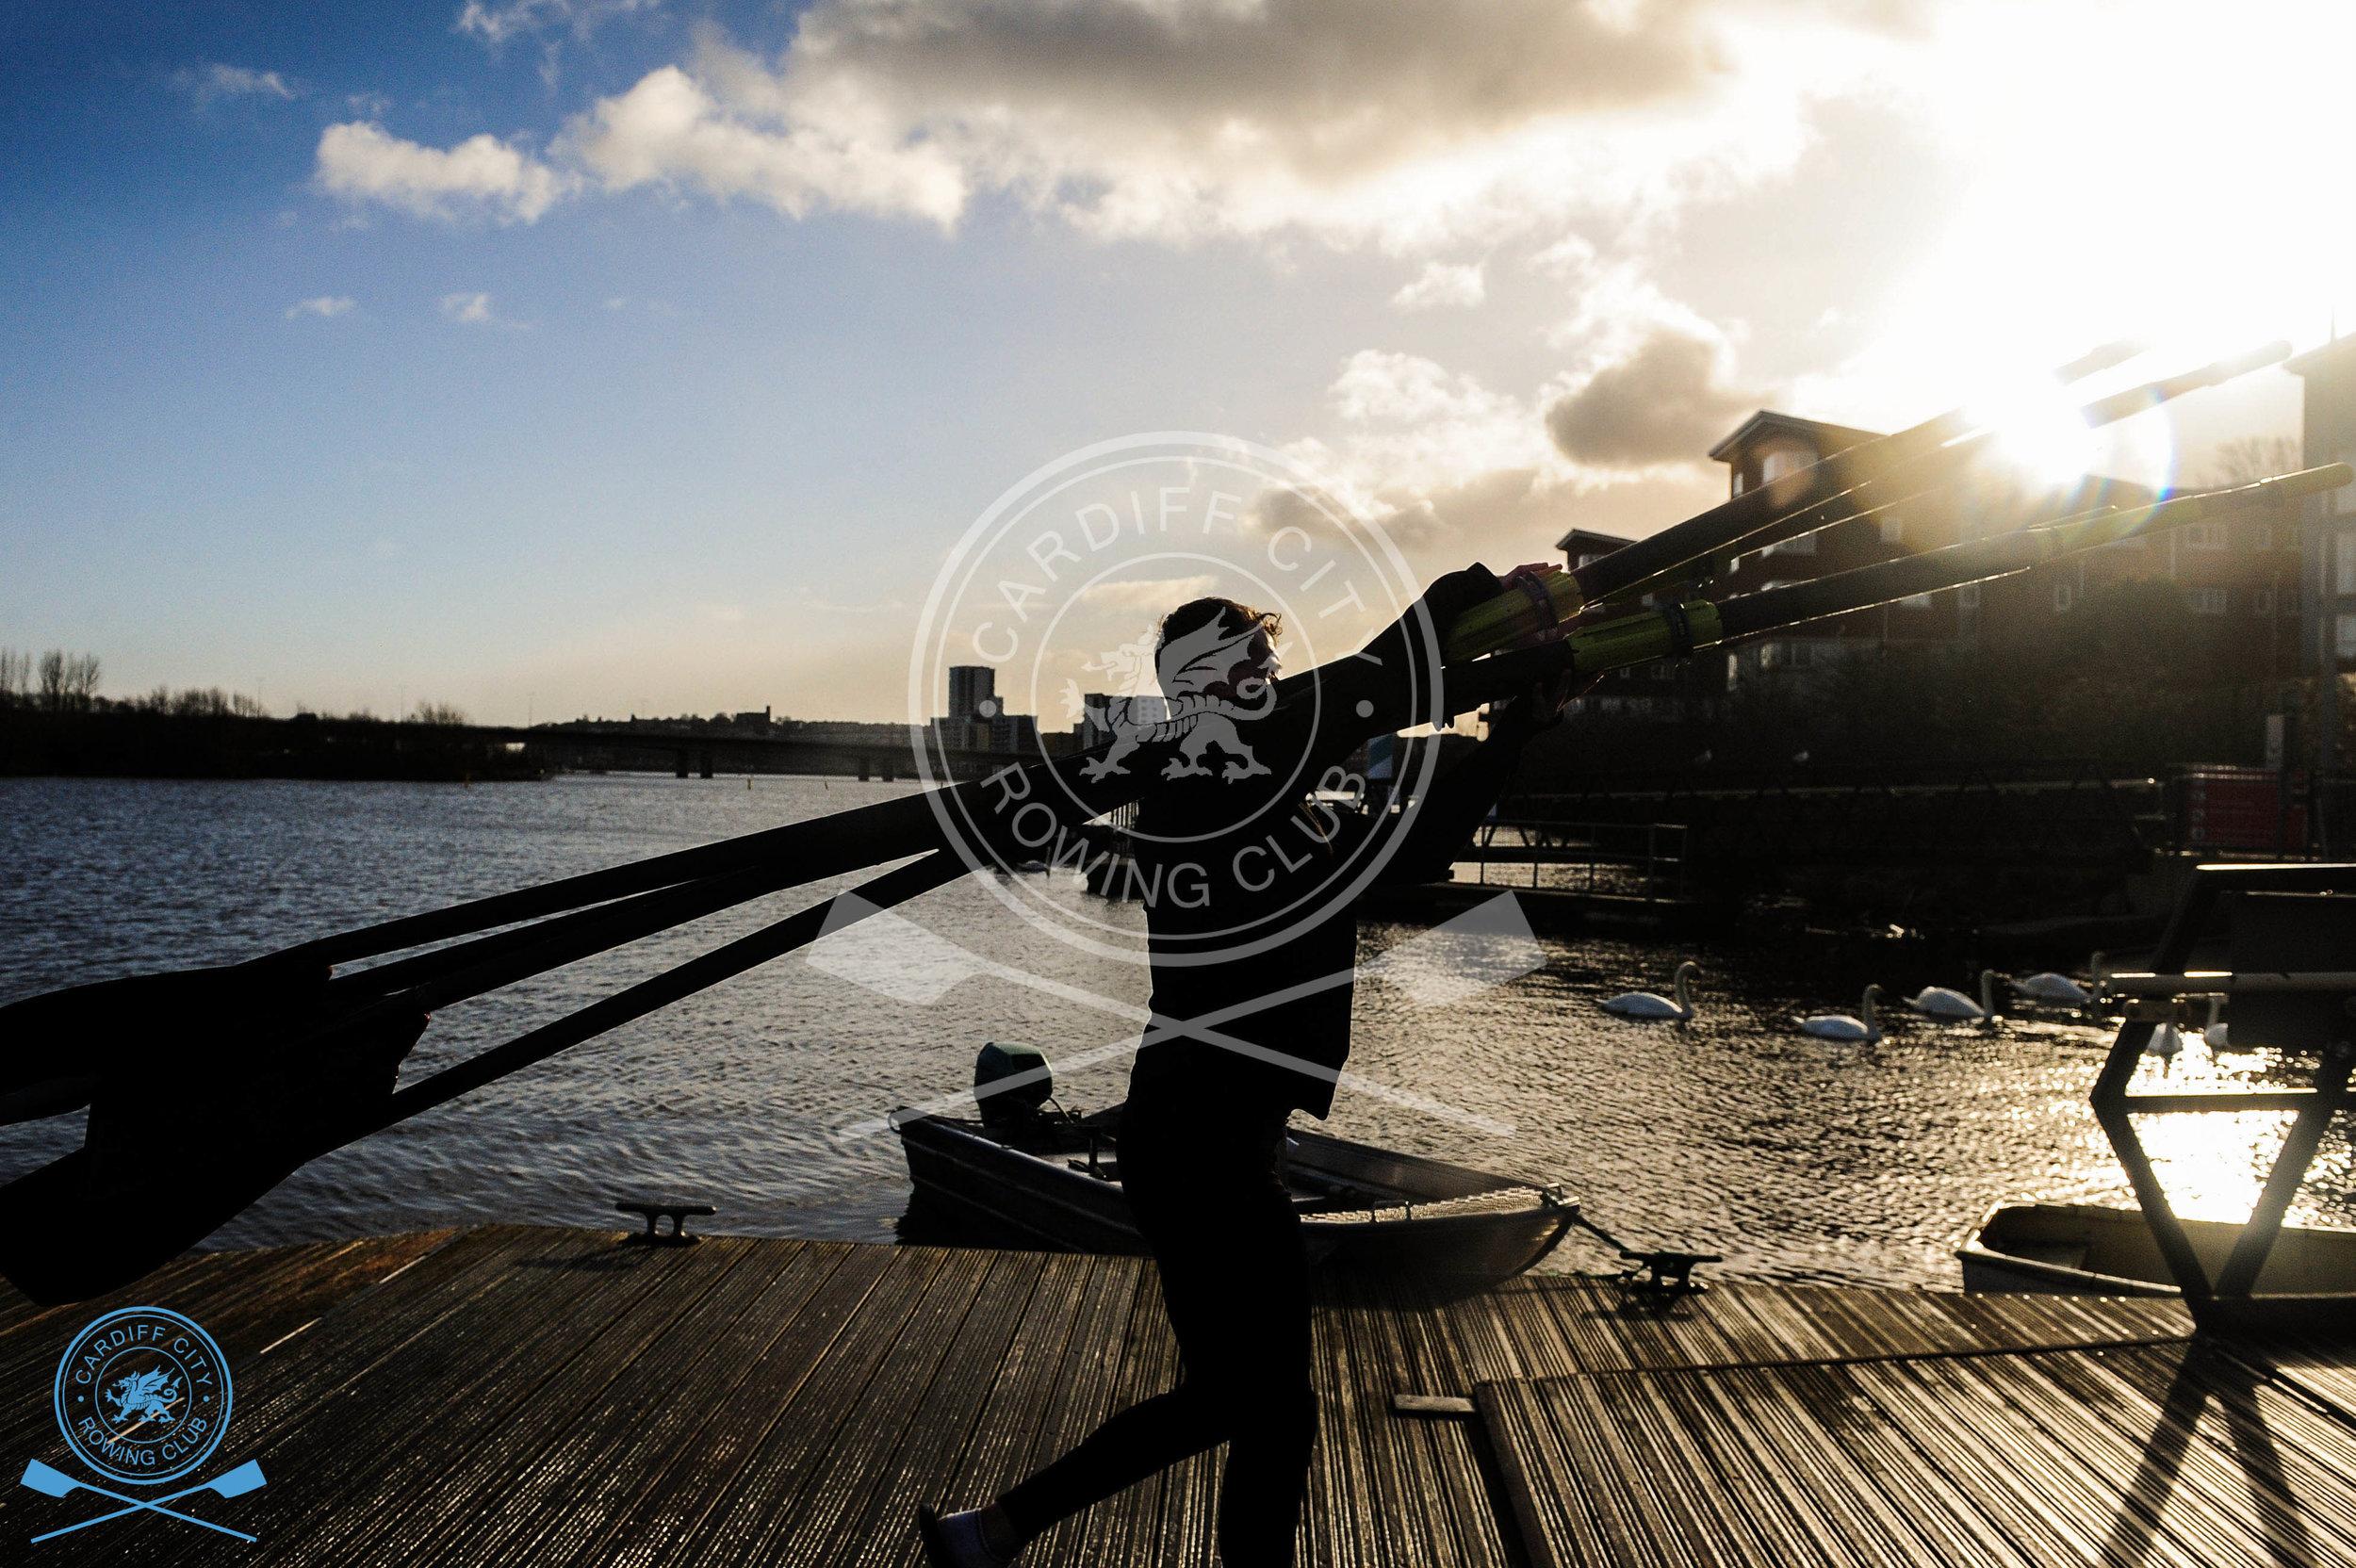 DW_280119_Cardiff_City_Rowing_337.jpg